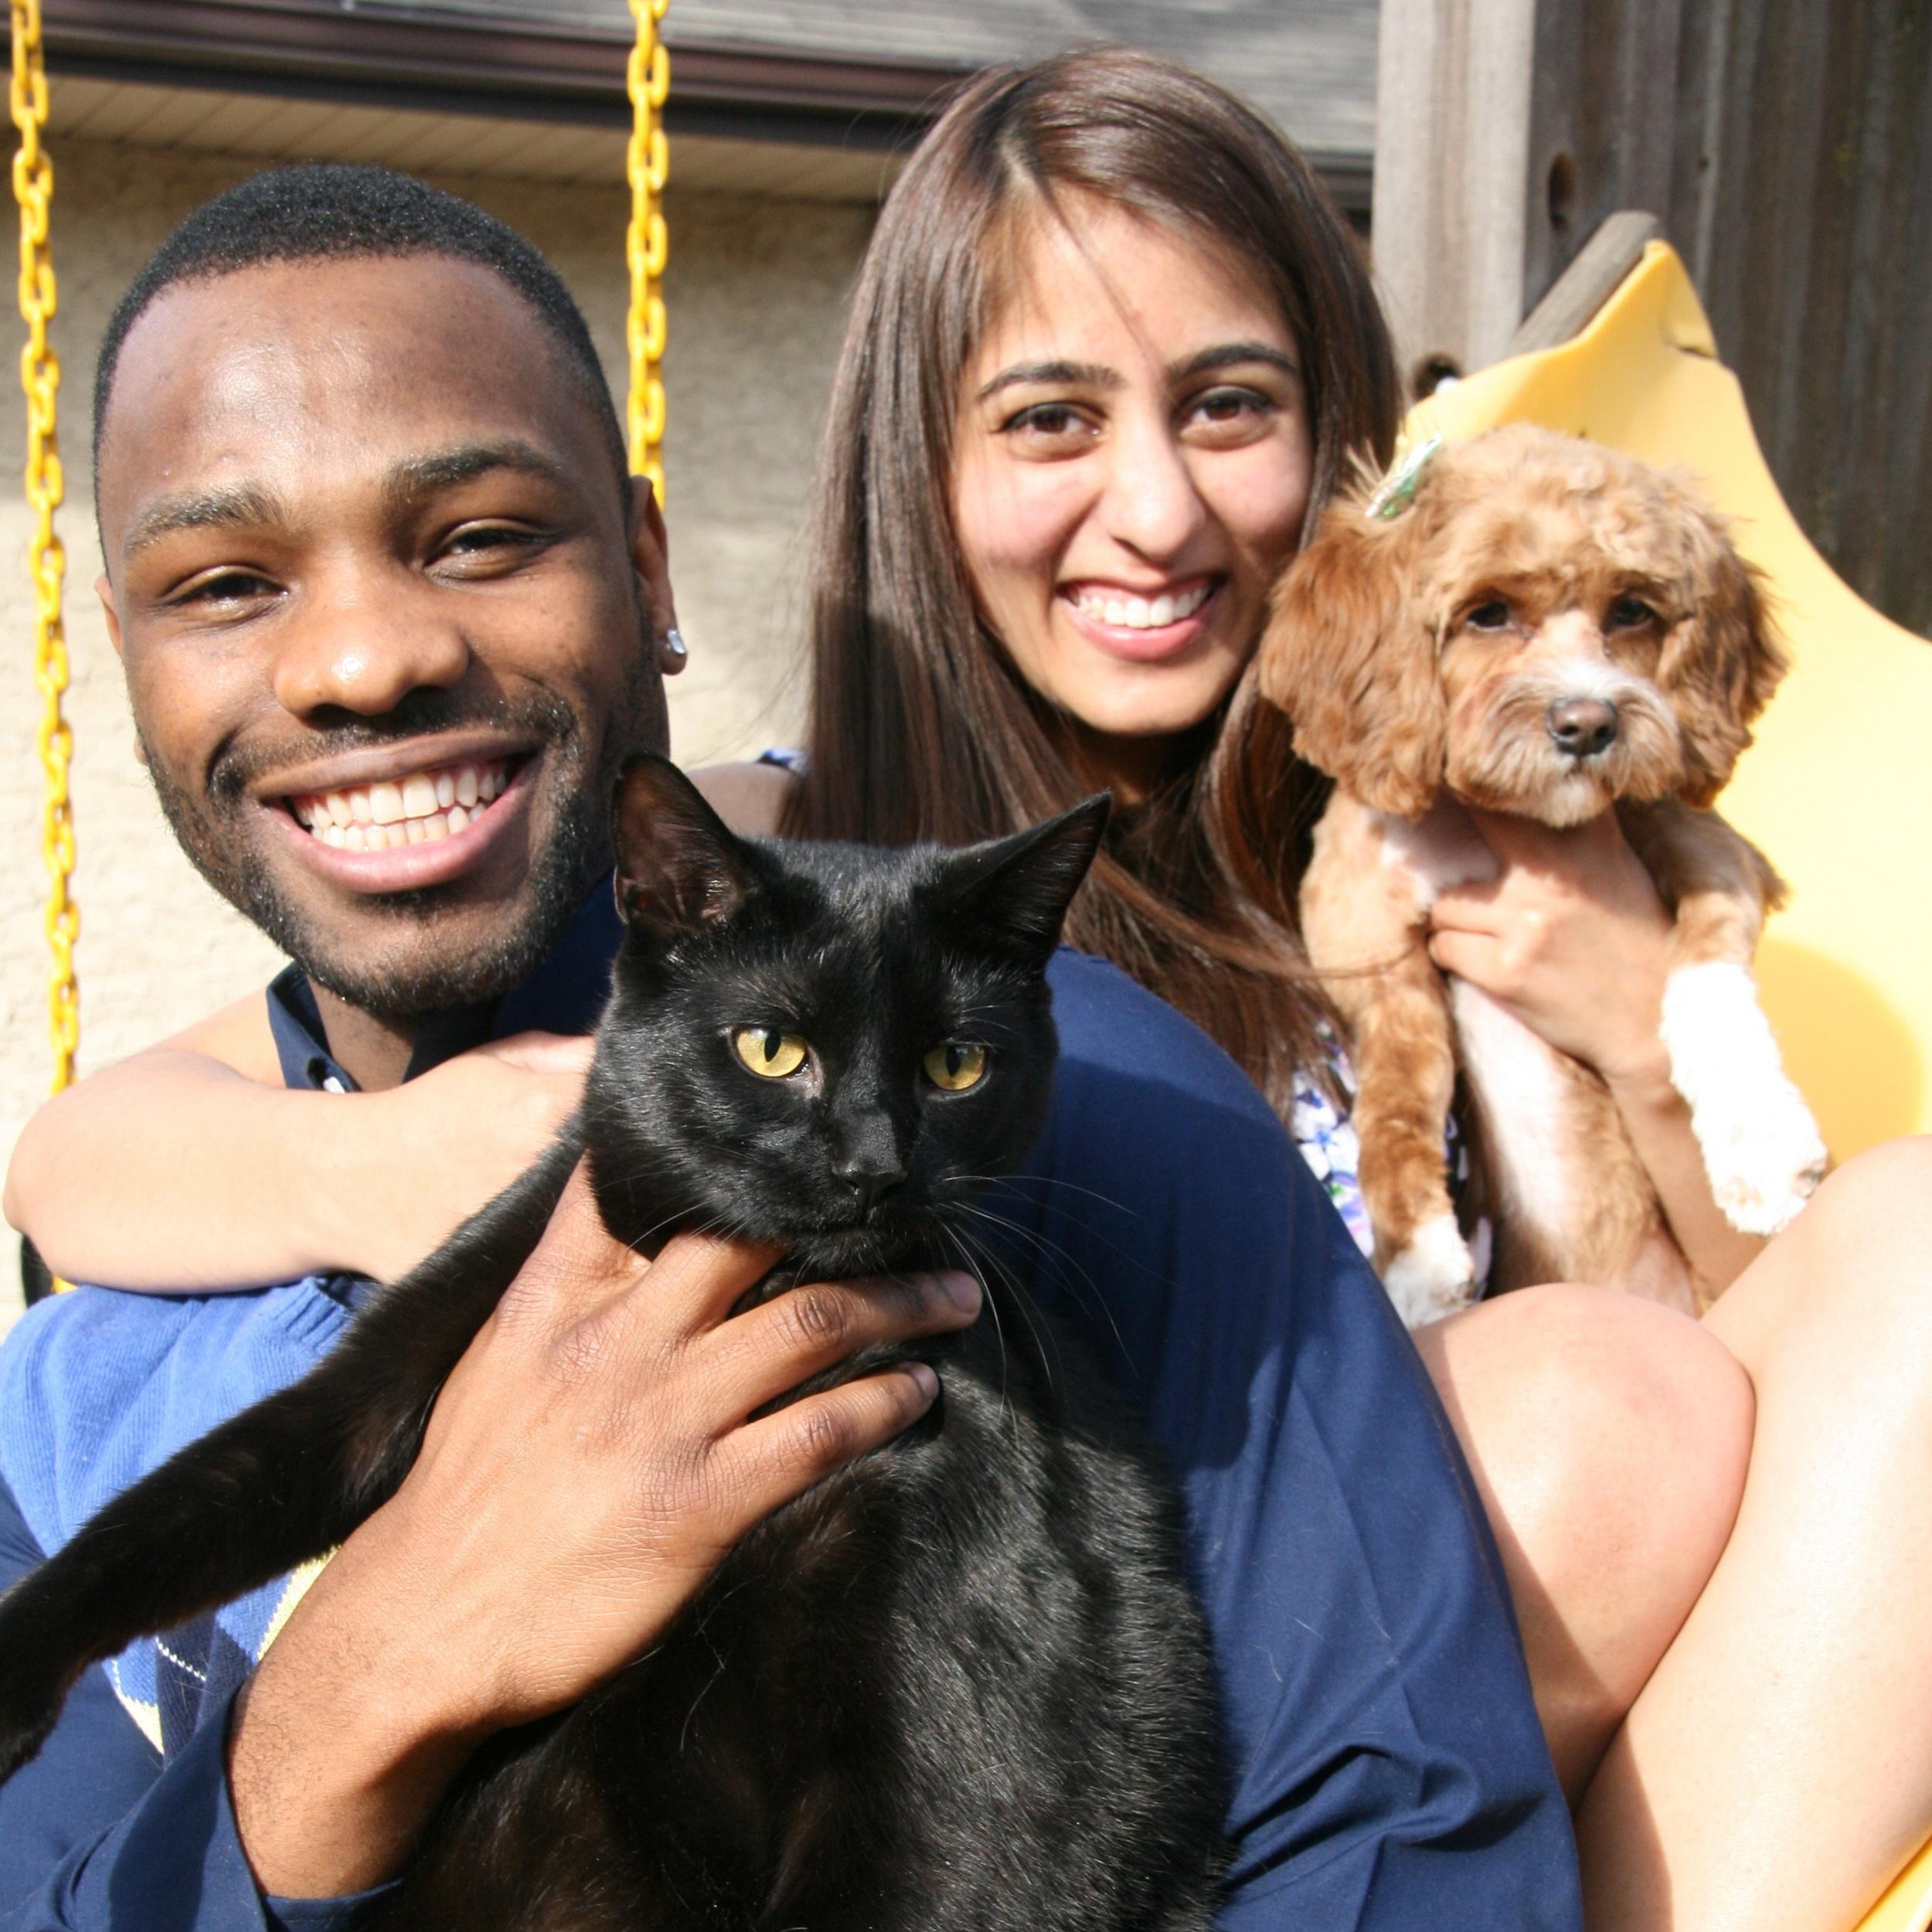 Yakasah with his wife, Esha and their cat (Mufasah) and dog (Kaira).